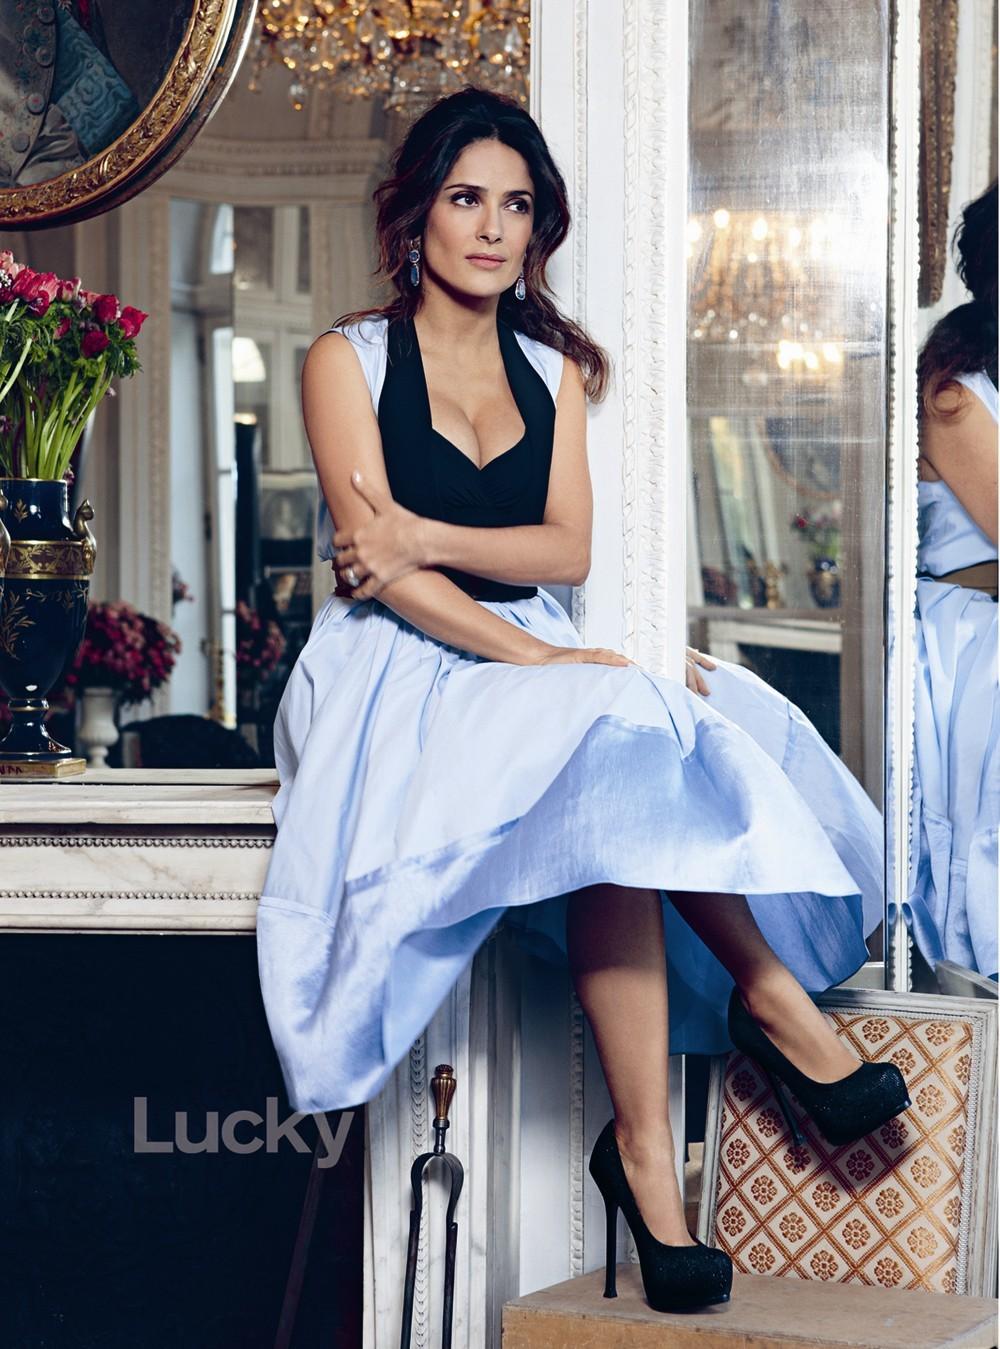 salma hayek lucky magazine